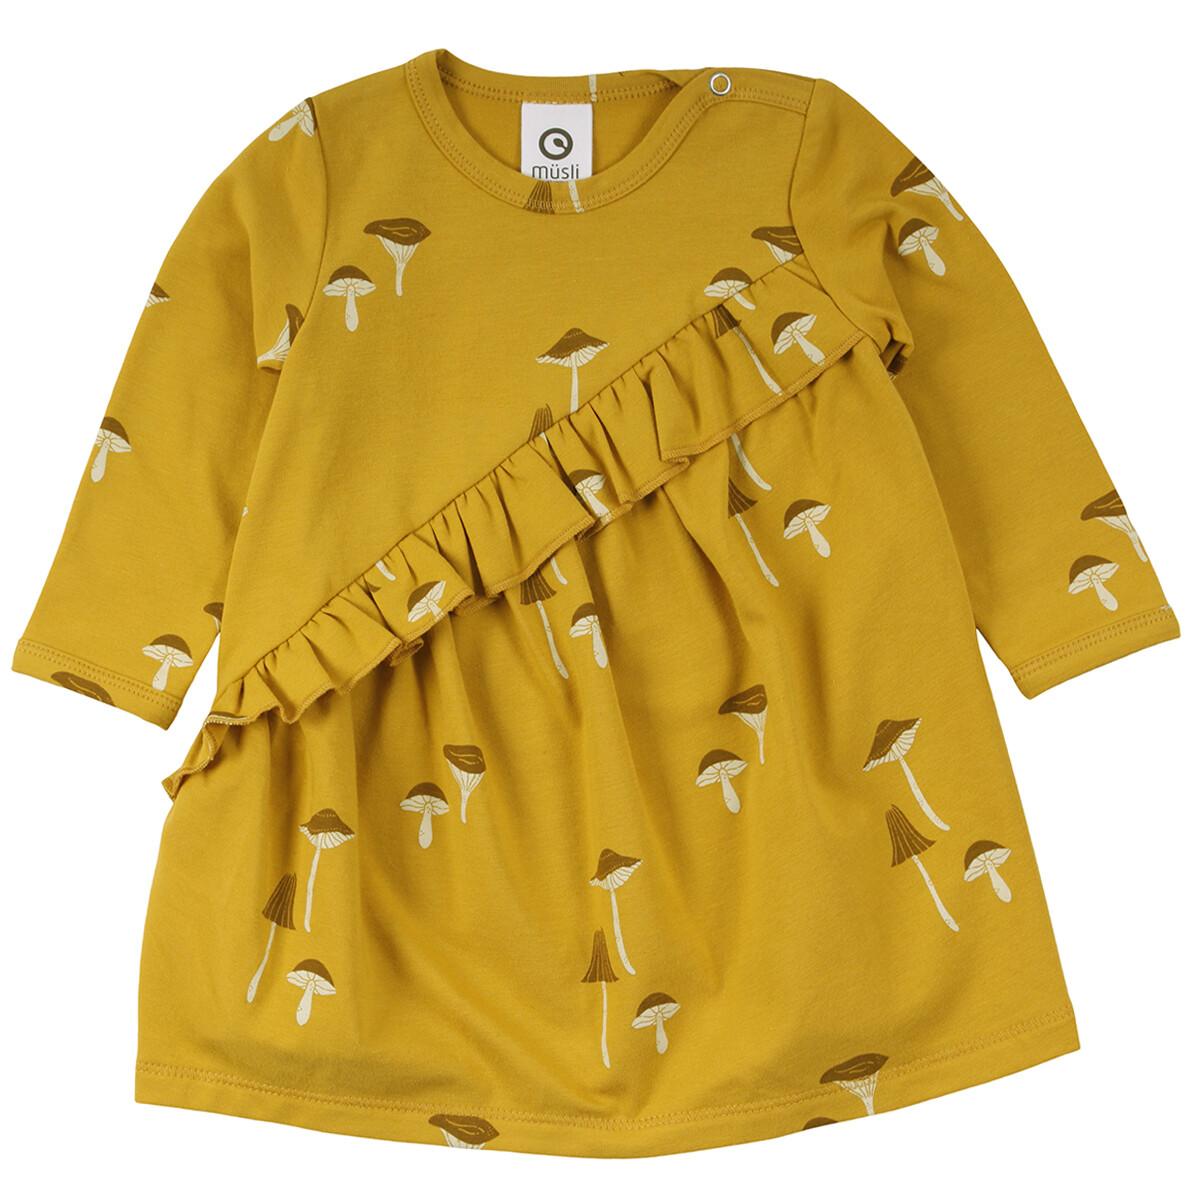 Musli Baby Girls Mustard Chanterelle Dress